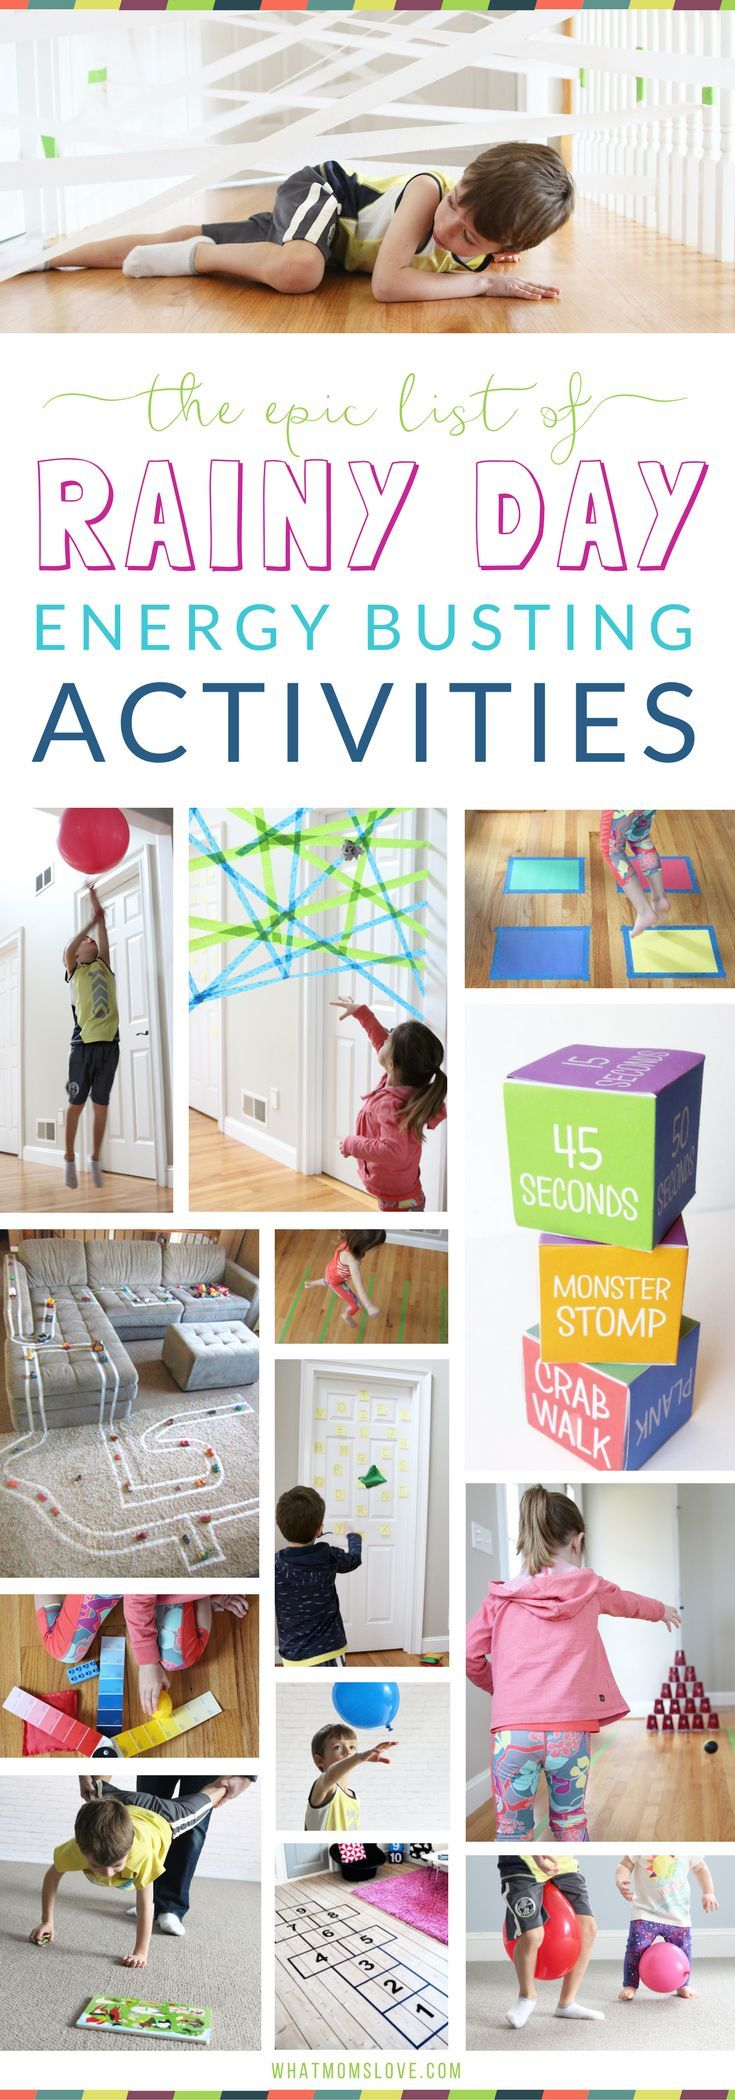 87 energy busting indoor games activities for kids for Energy games for kids